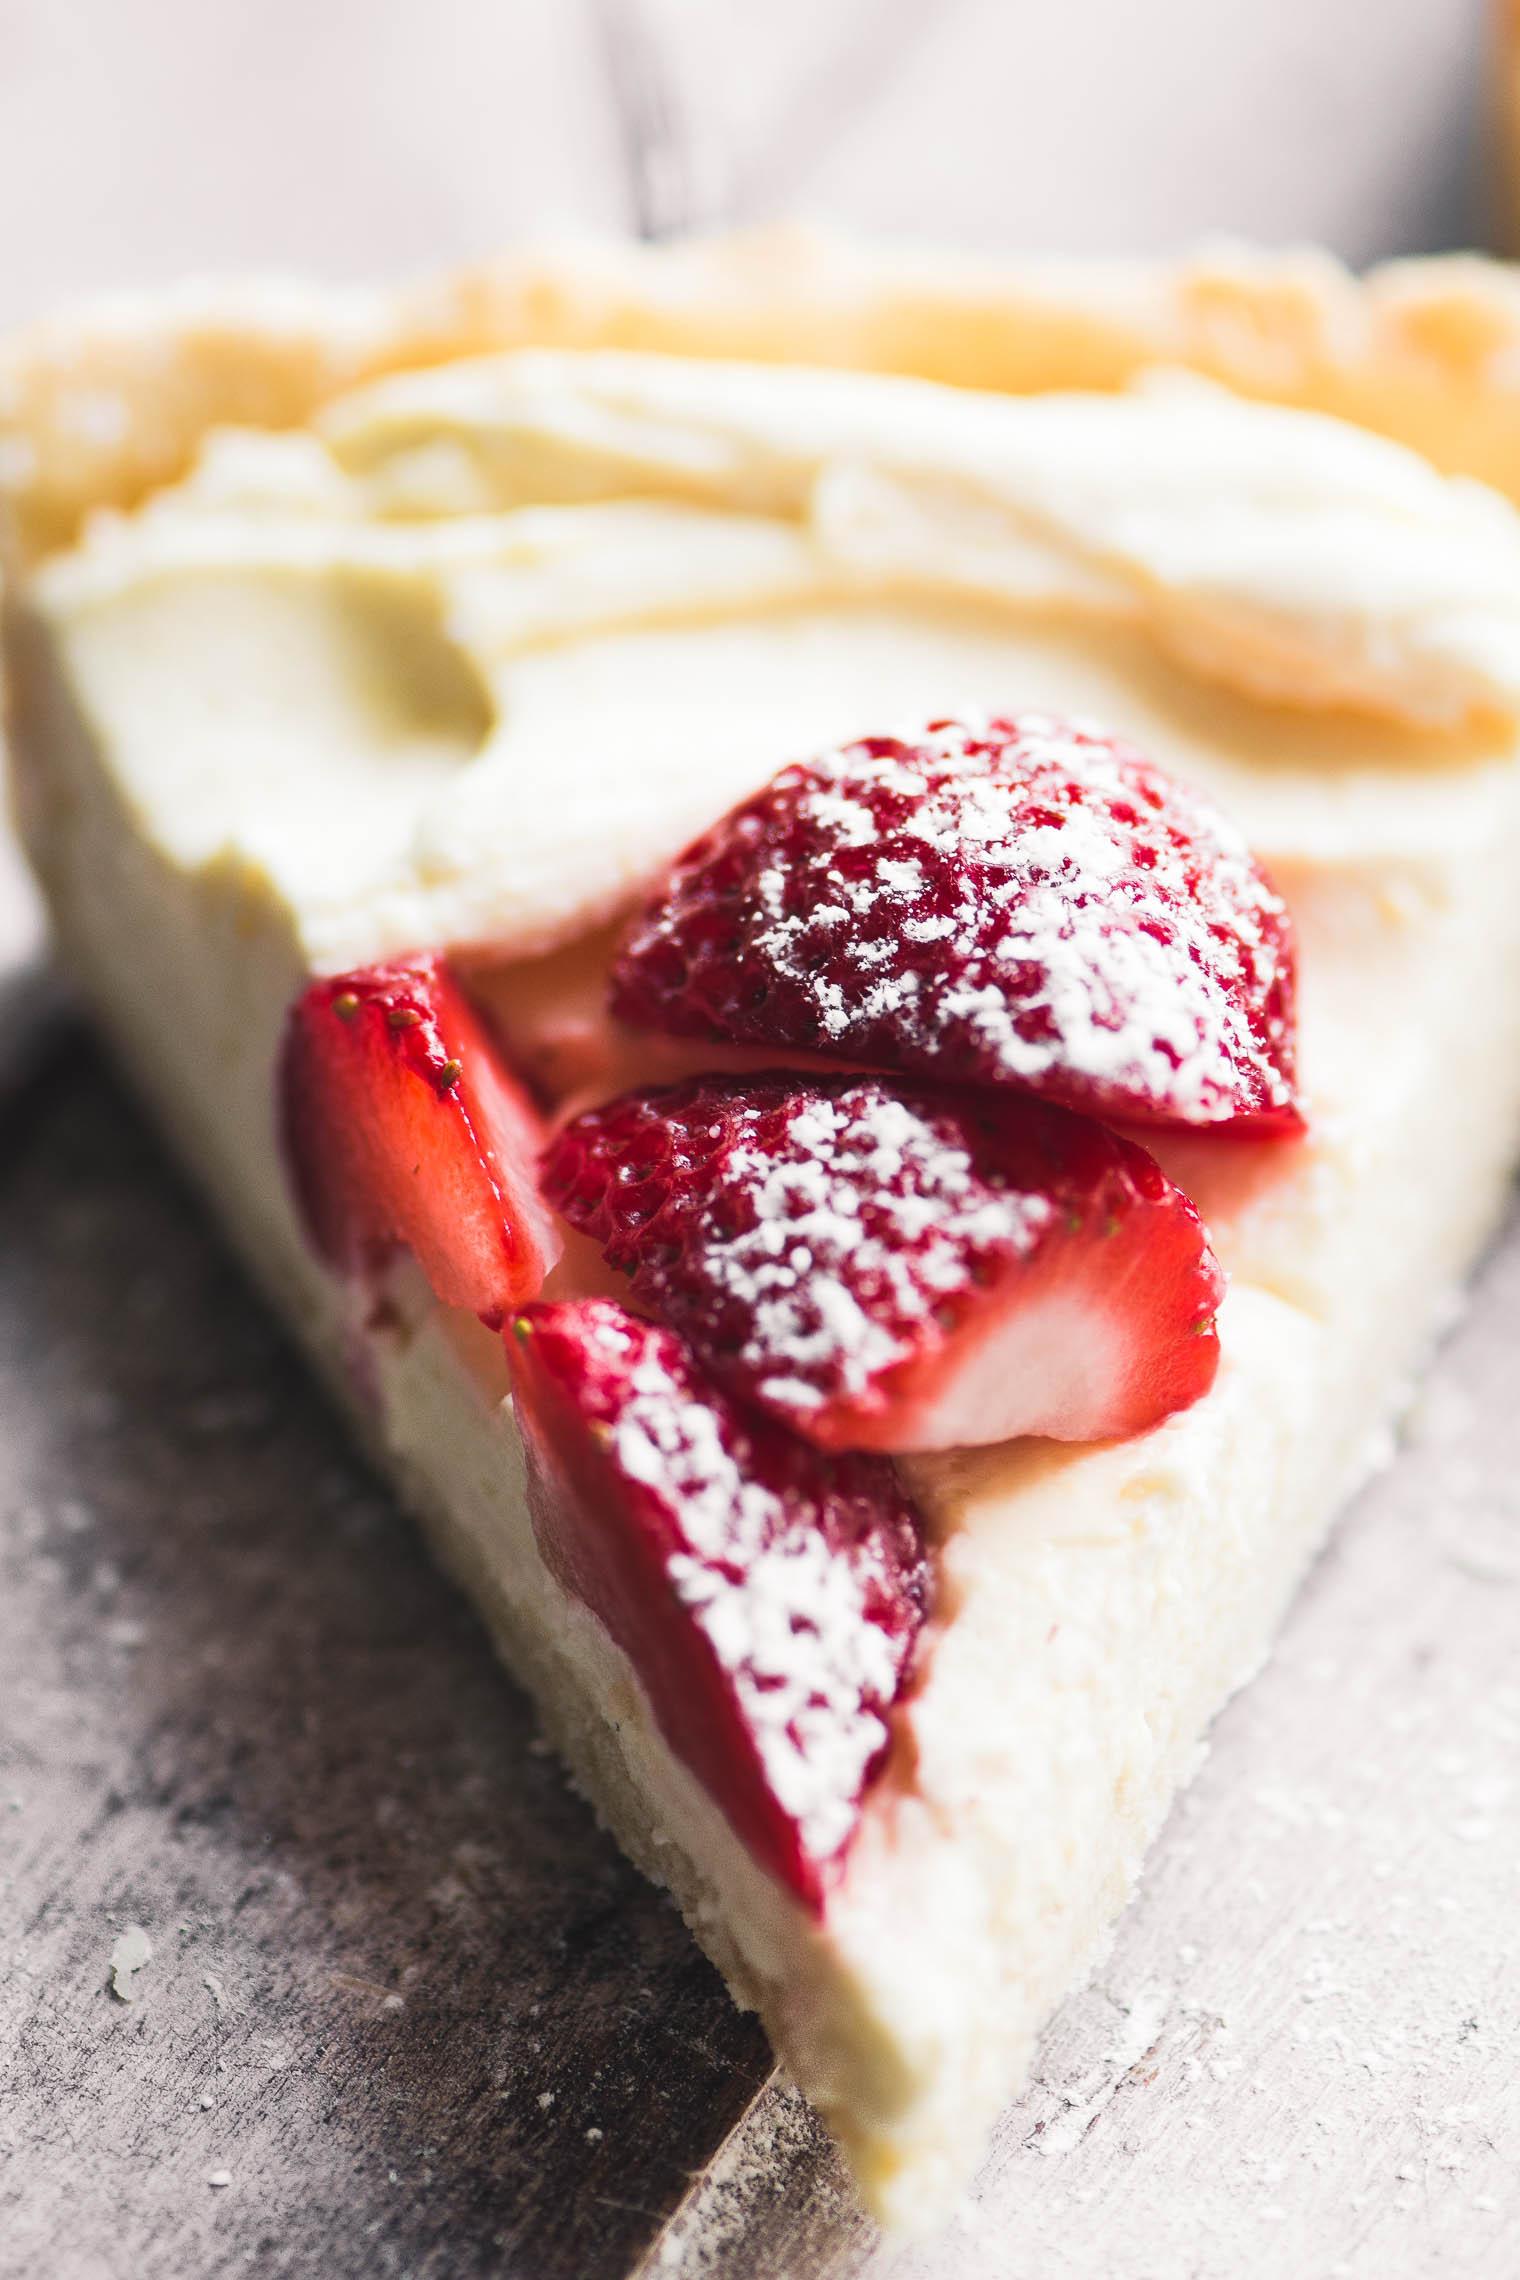 a slice of strawberries and cream tart